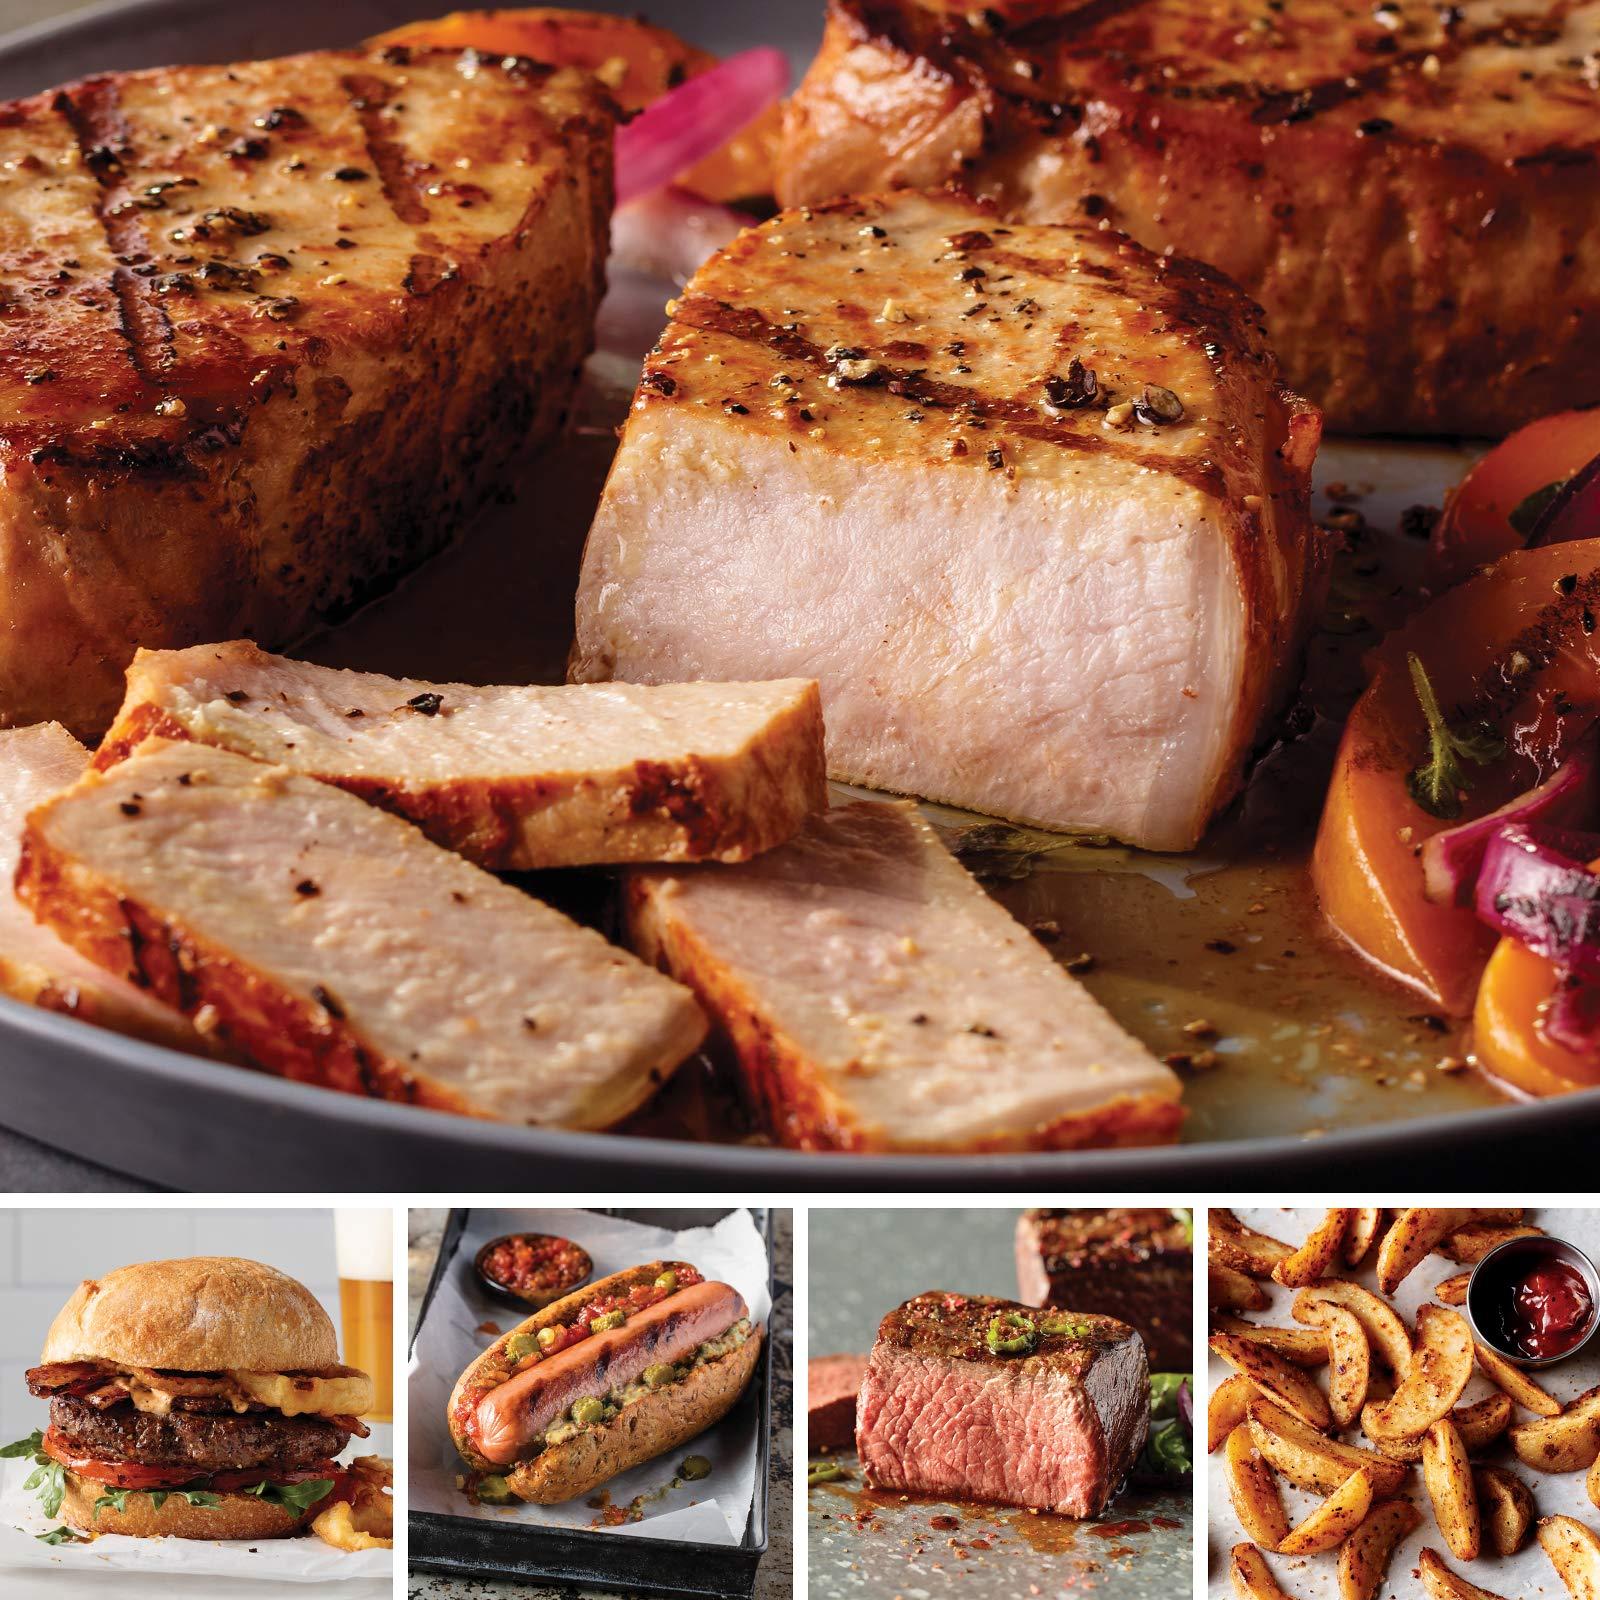 Omaha Steaks Most Wonderful Time Sampler (13-Piece with Top Sirloins, Boneless Pork Chops, Steak Burgers, Jumbo Franks, and Steakhouse Fries)